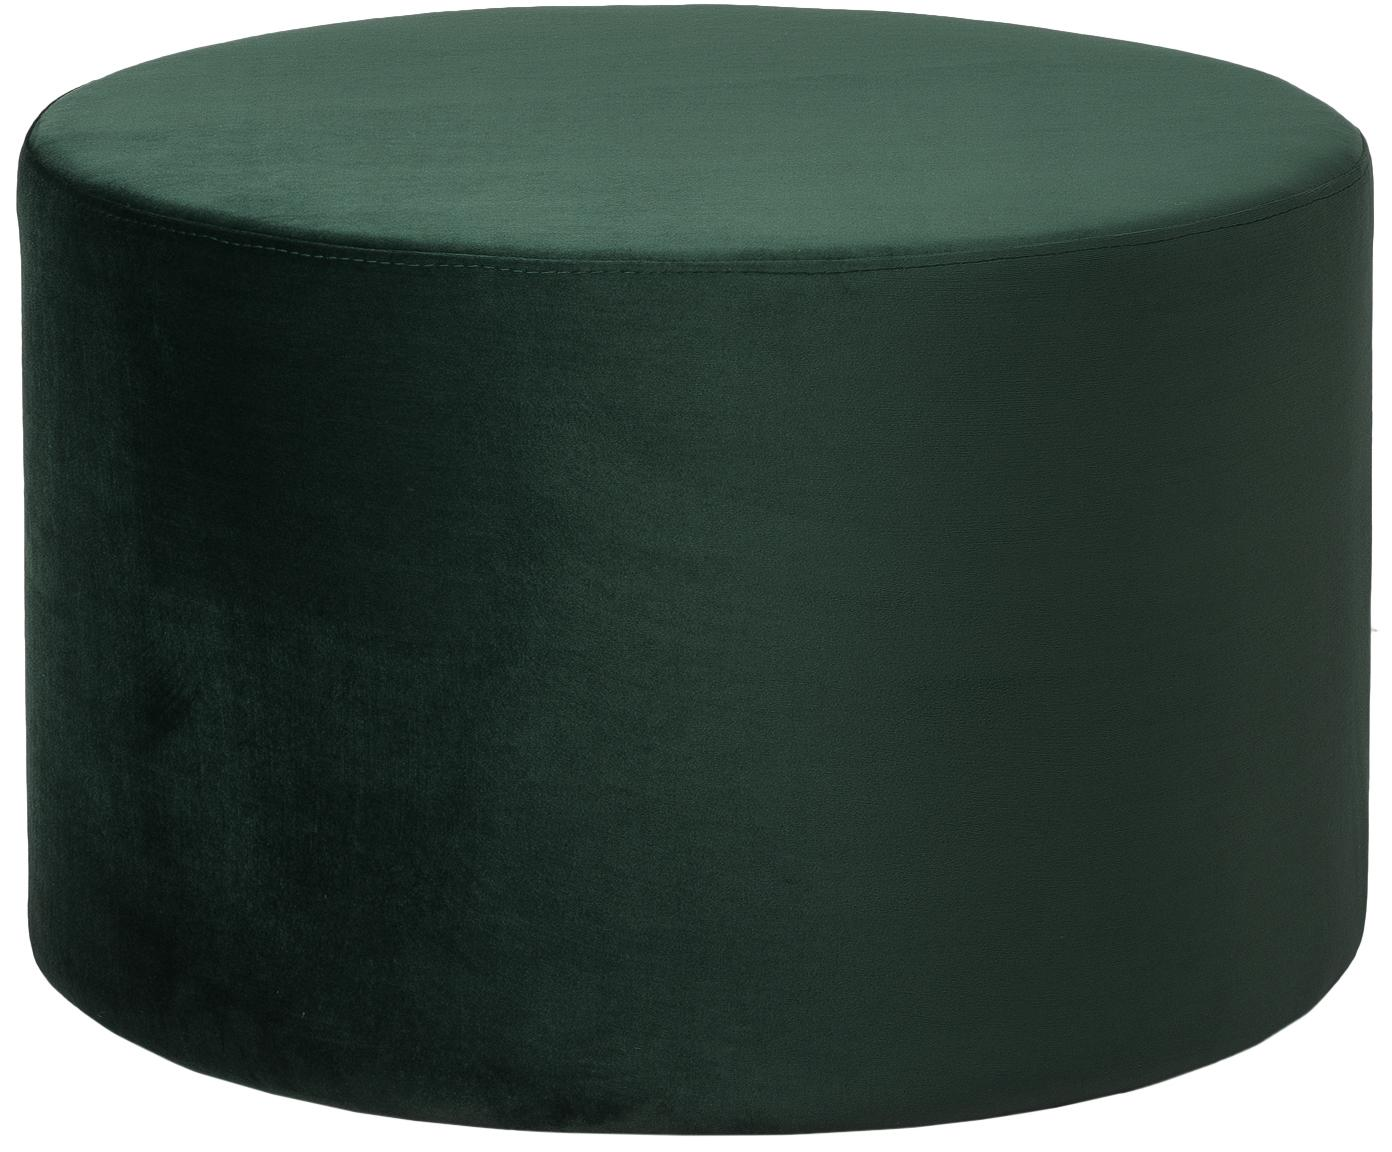 Samt-Hocker Daisy, Bezug: Samt (Polyester) 15.000 S, Rahmen: Mitteldichte Holzfaserpla, Dunkelgrün, Ø 60 x H 41 cm